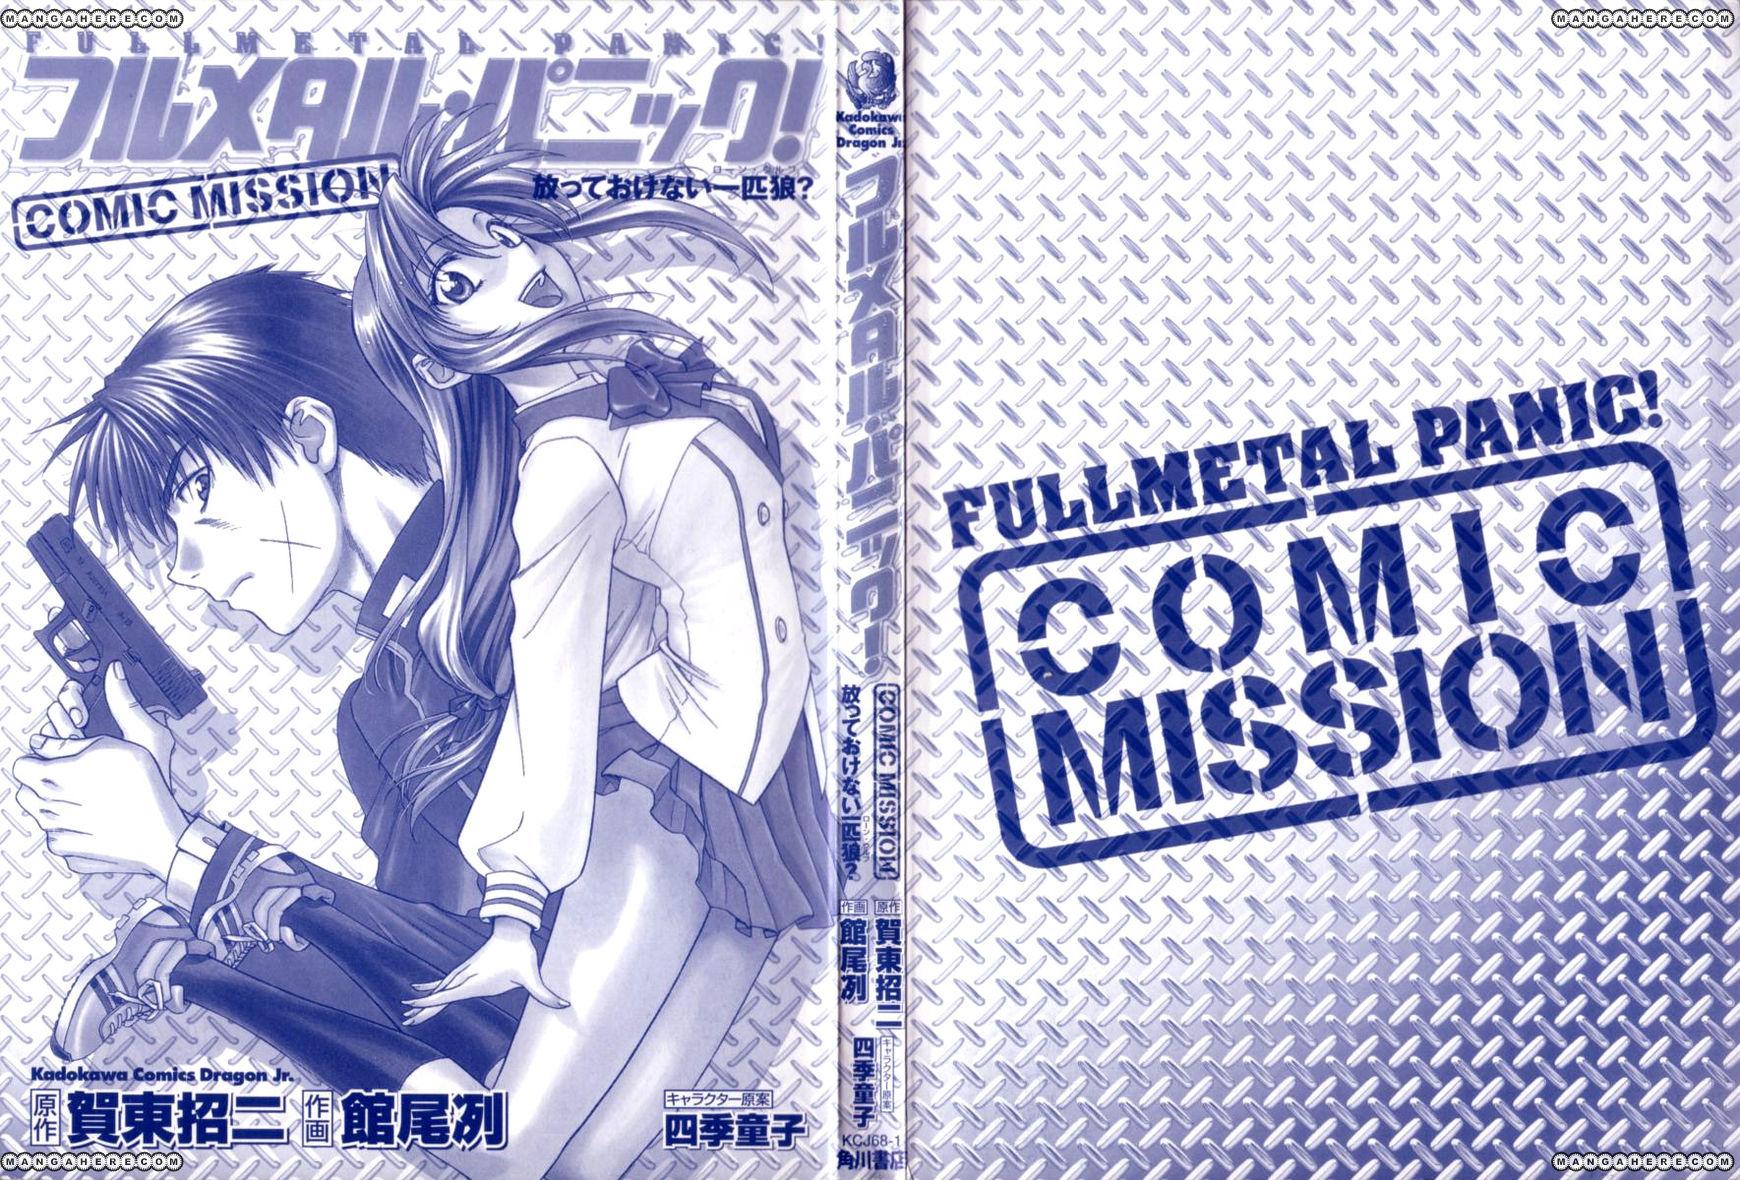 Full Metal Panic Comic Mission 5.5 Page 3